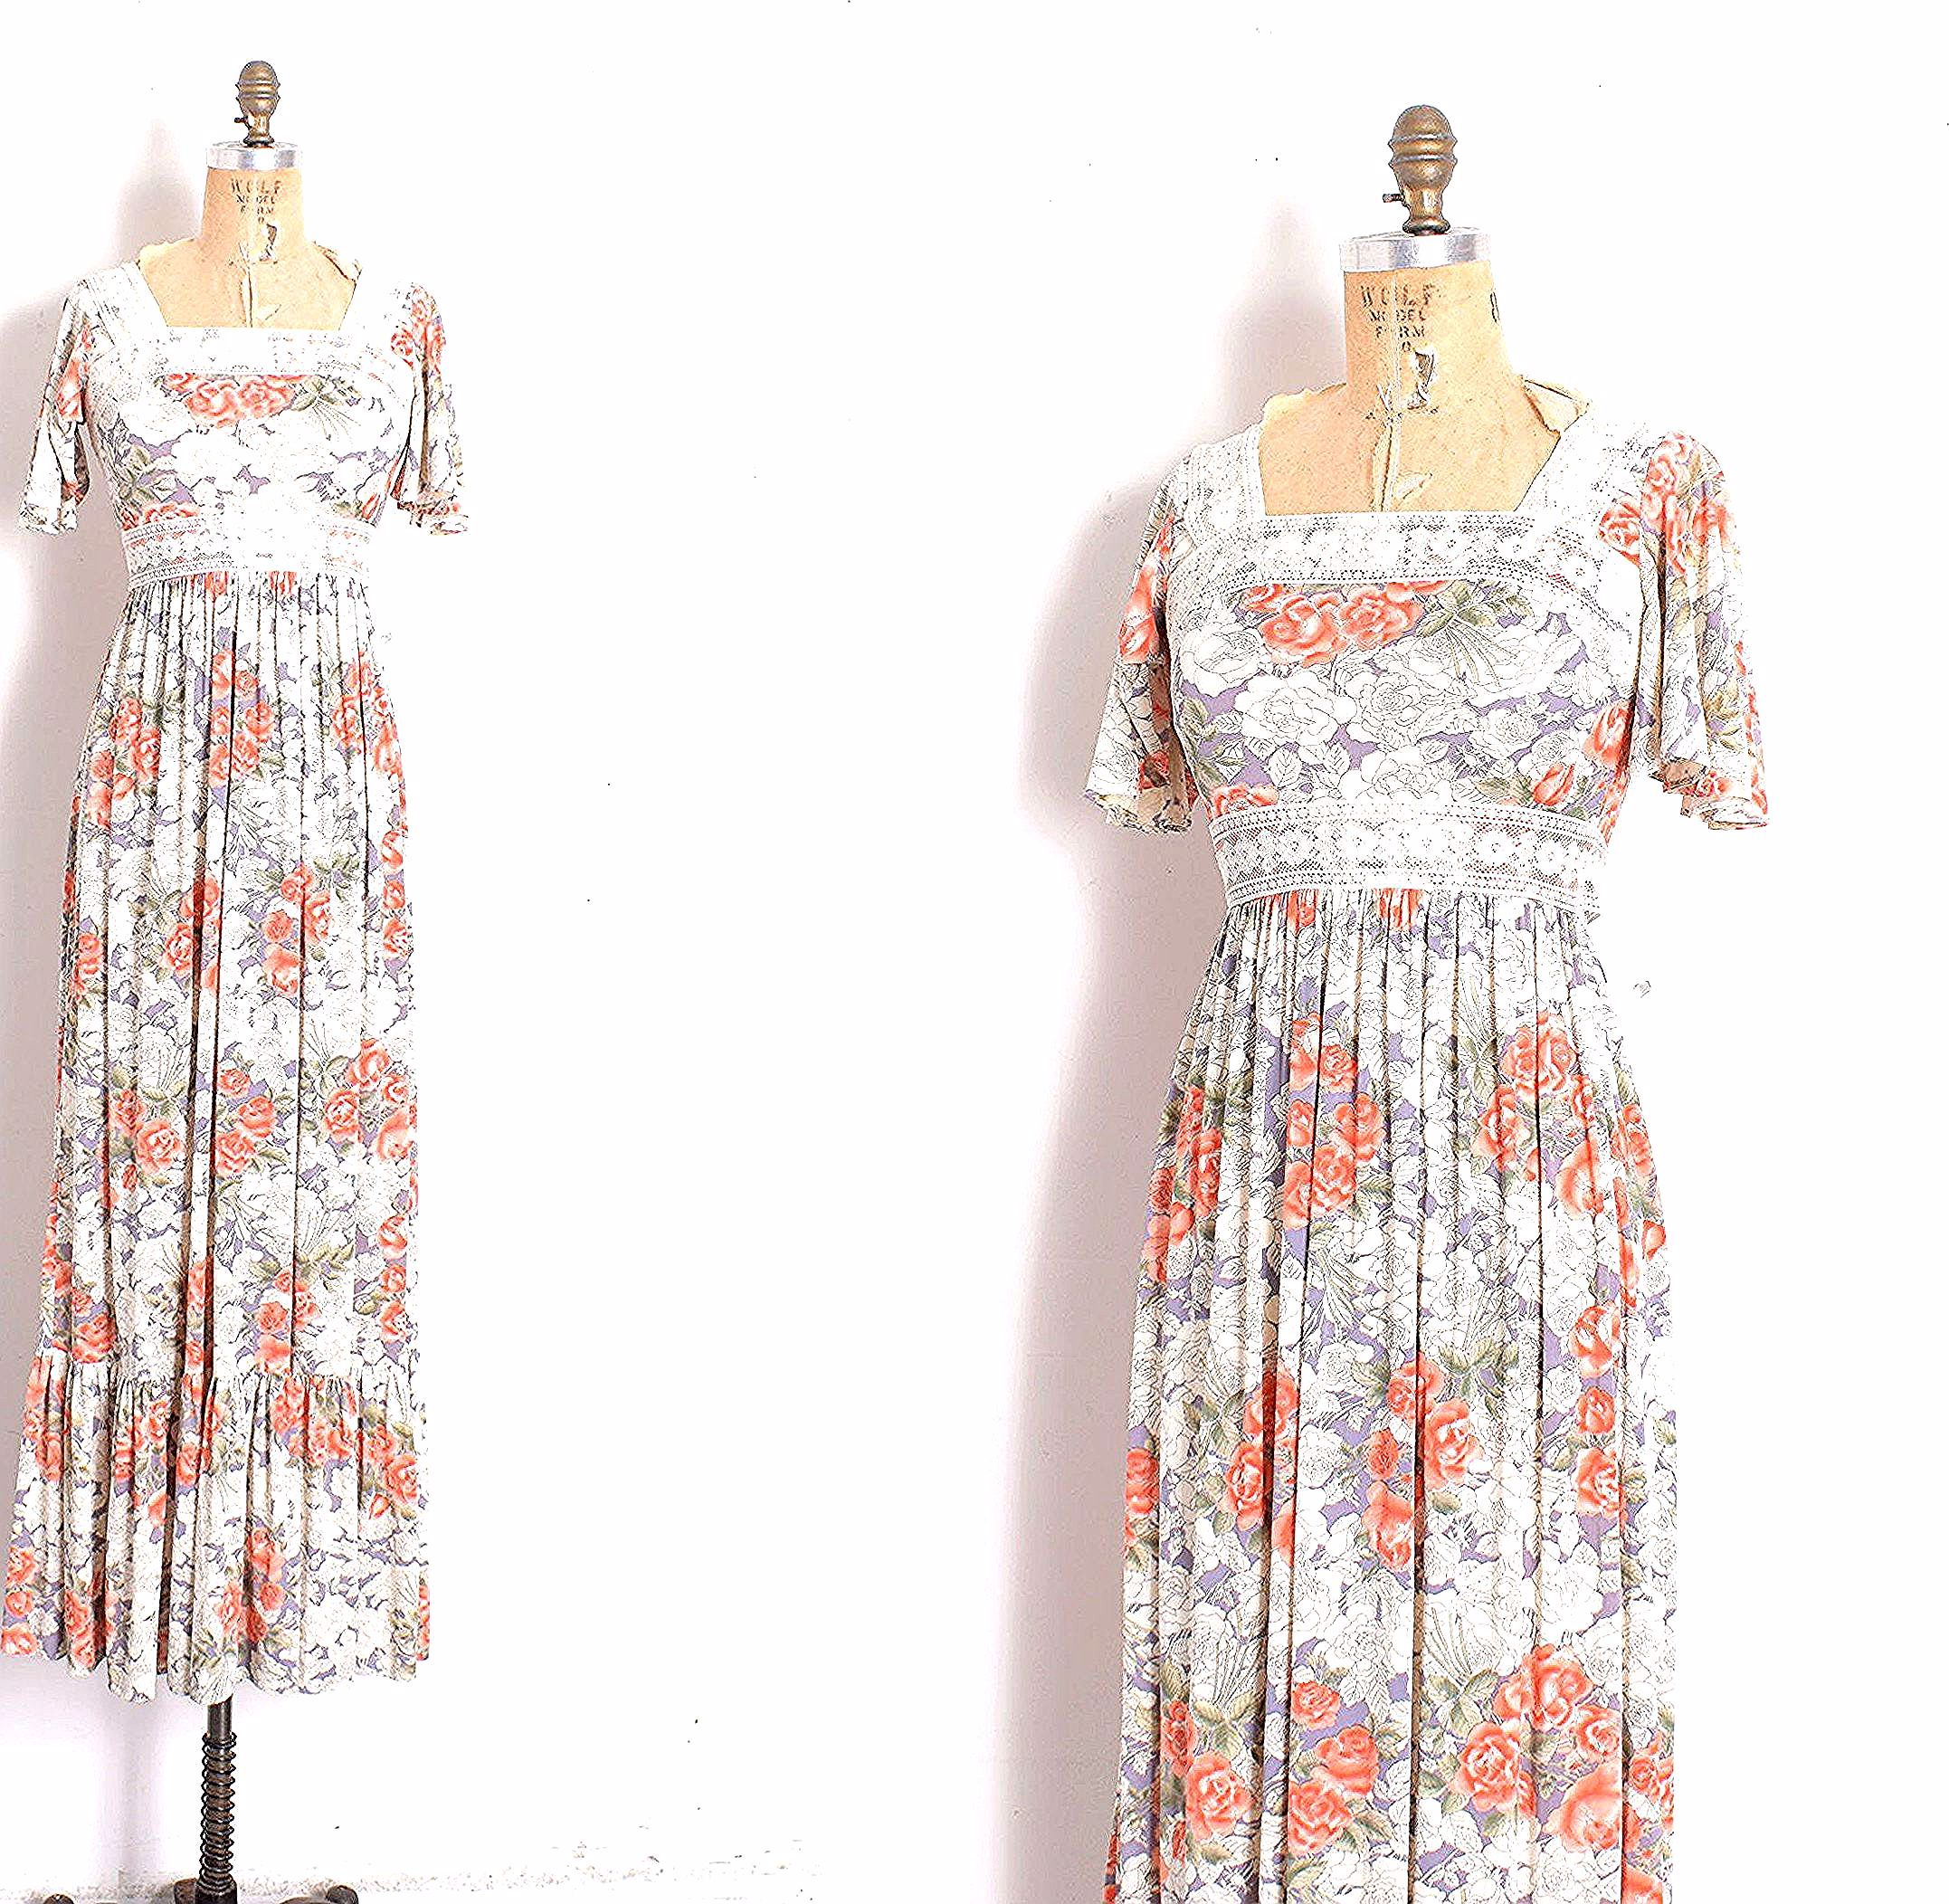 1980s Slouchy Marbled Sweater Dress S M L La Poubelle Vintage In 2020 Dresses Sweater Dress Dresss